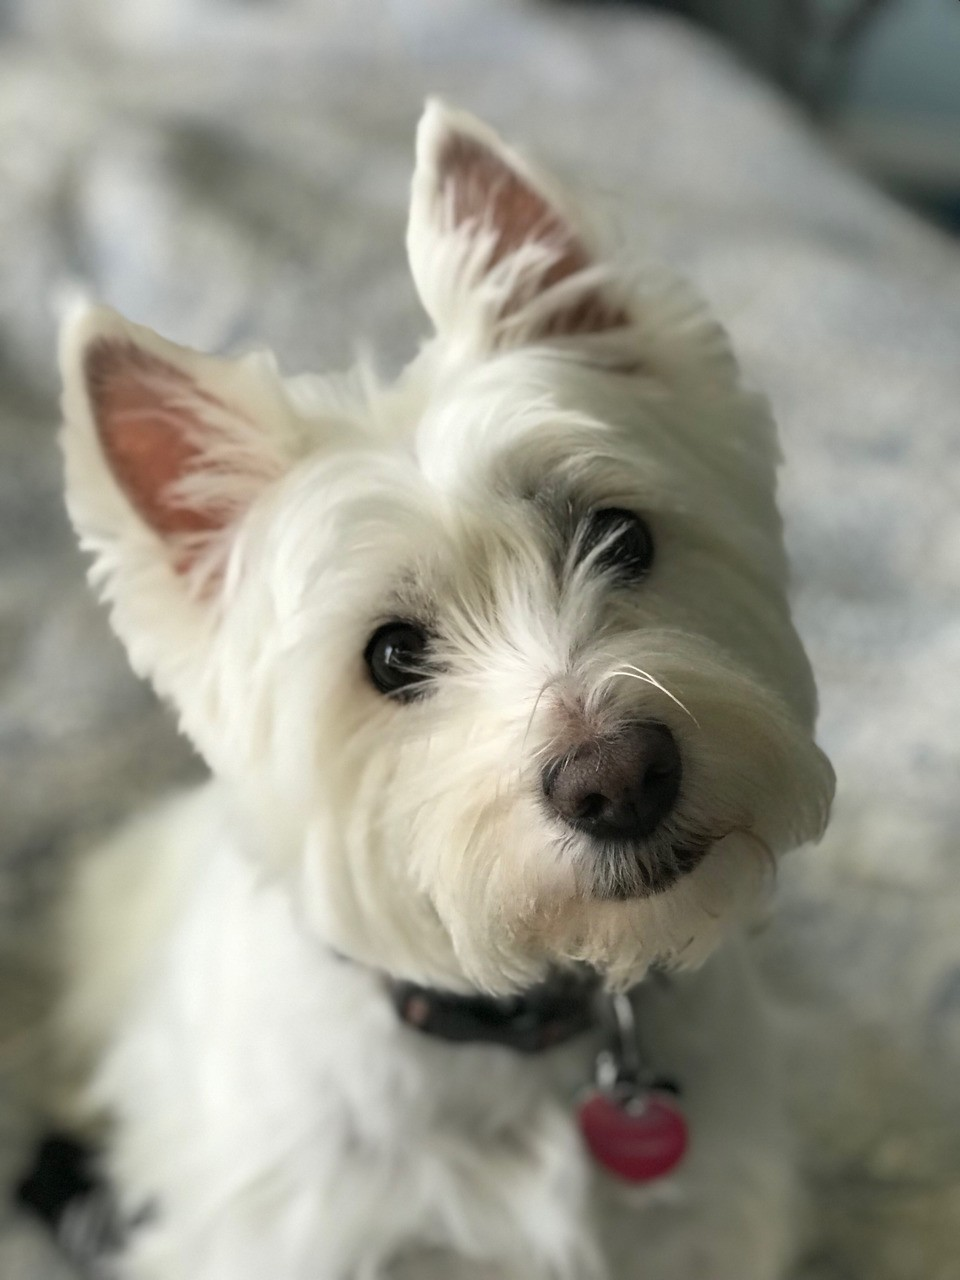 This dog is as cute as they come. #annie #annieisawestie #westiesarebesties #westhighlandterrier #westies #westielove